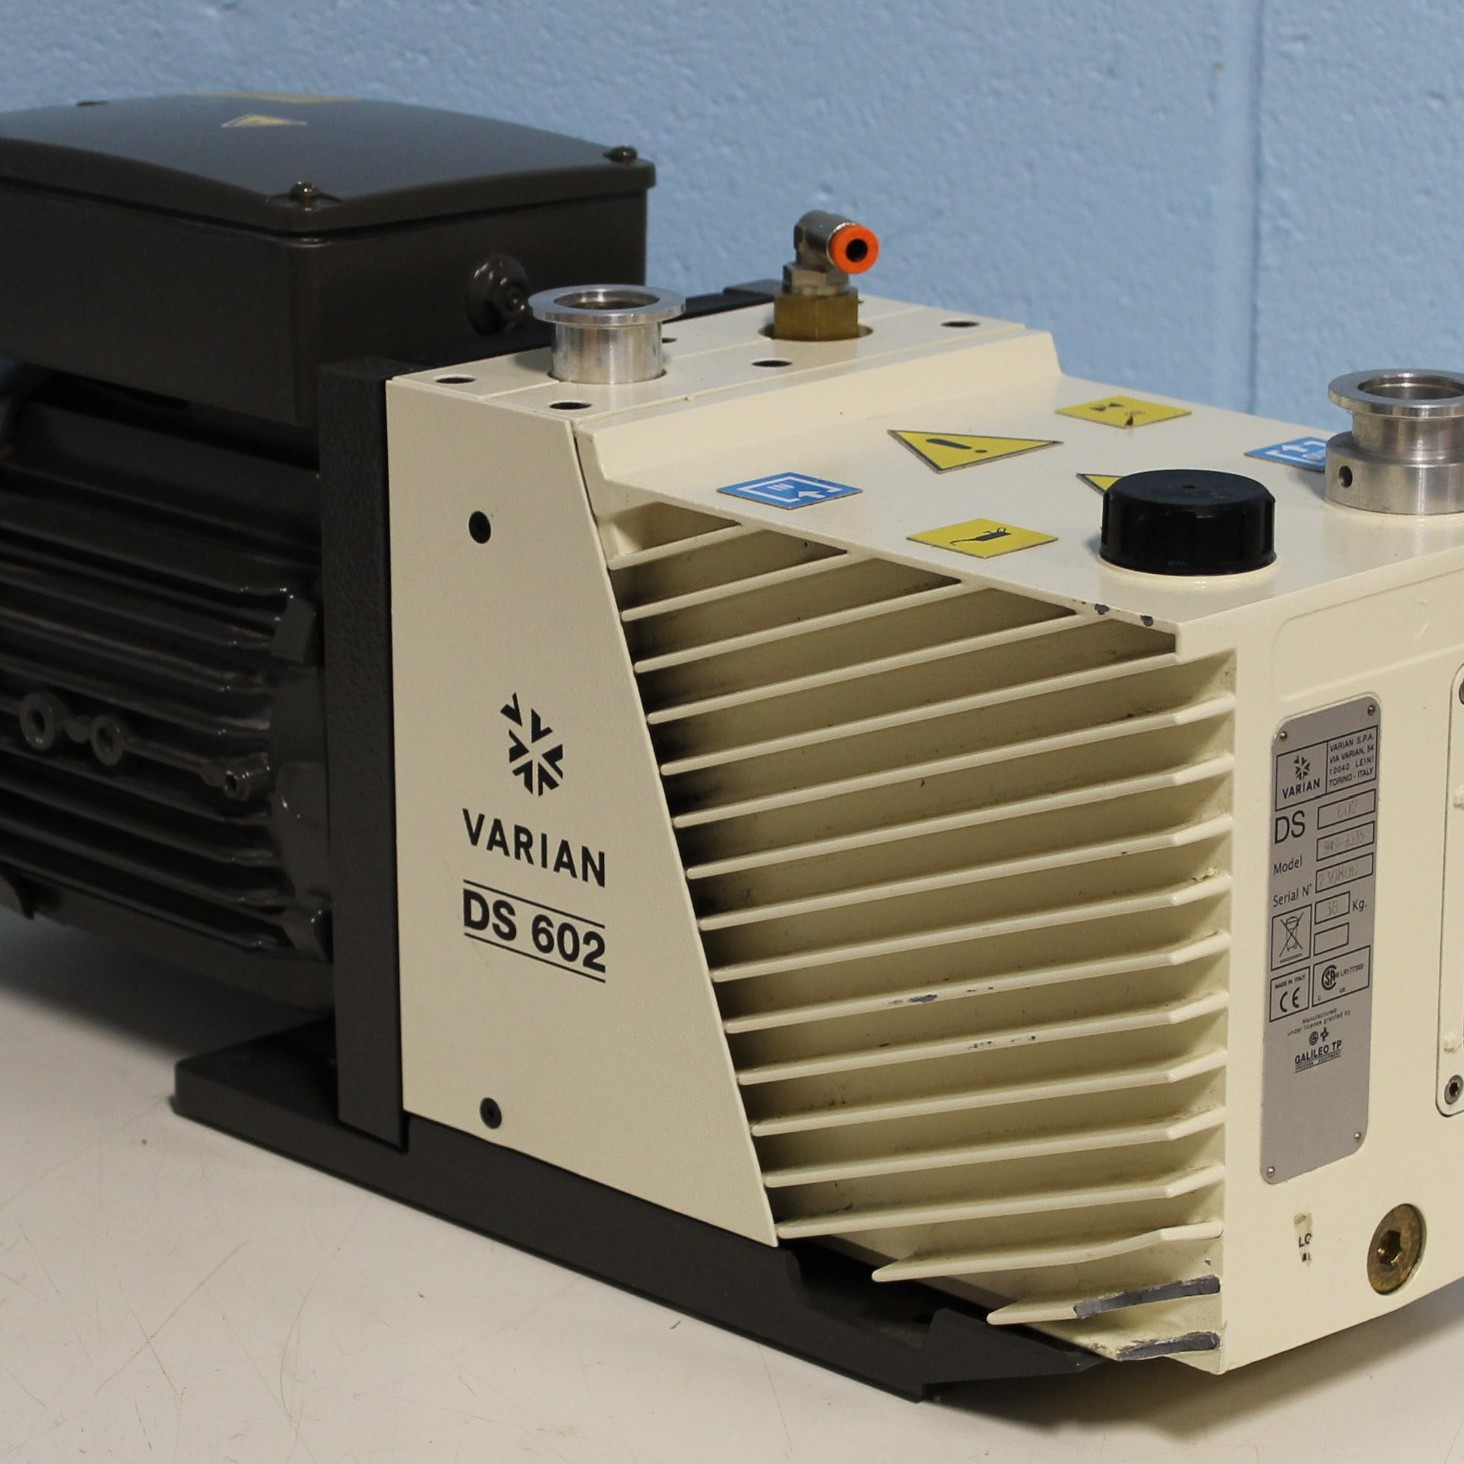 Varian DS602 Dual Stage Rotary Vane Vacuum Pump Image